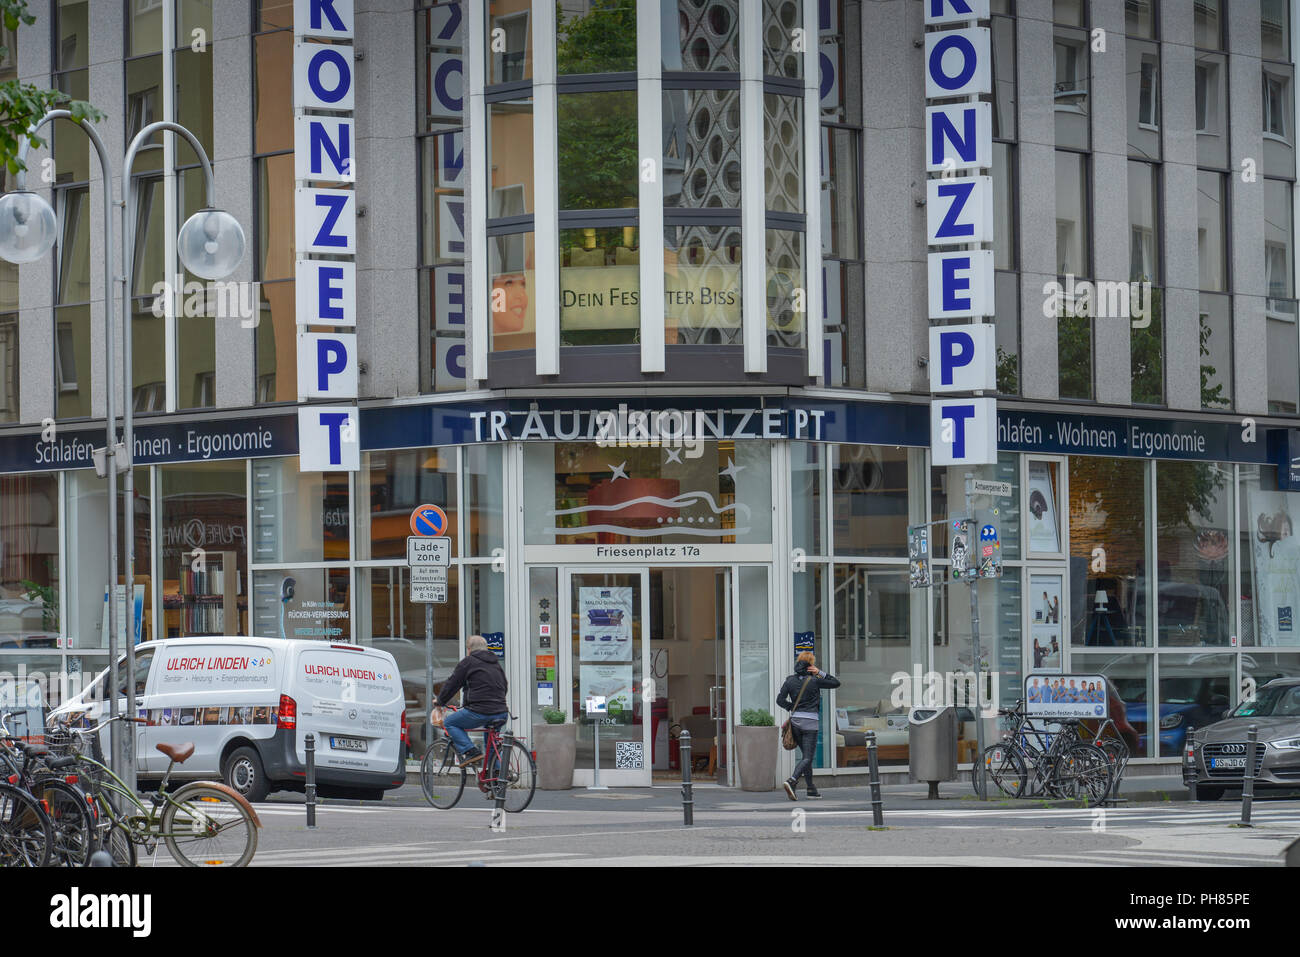 Friesenplatz 17A Köln bettenfachgeschaeft traumkonzept, friesenplatz, koeln, nordrhein